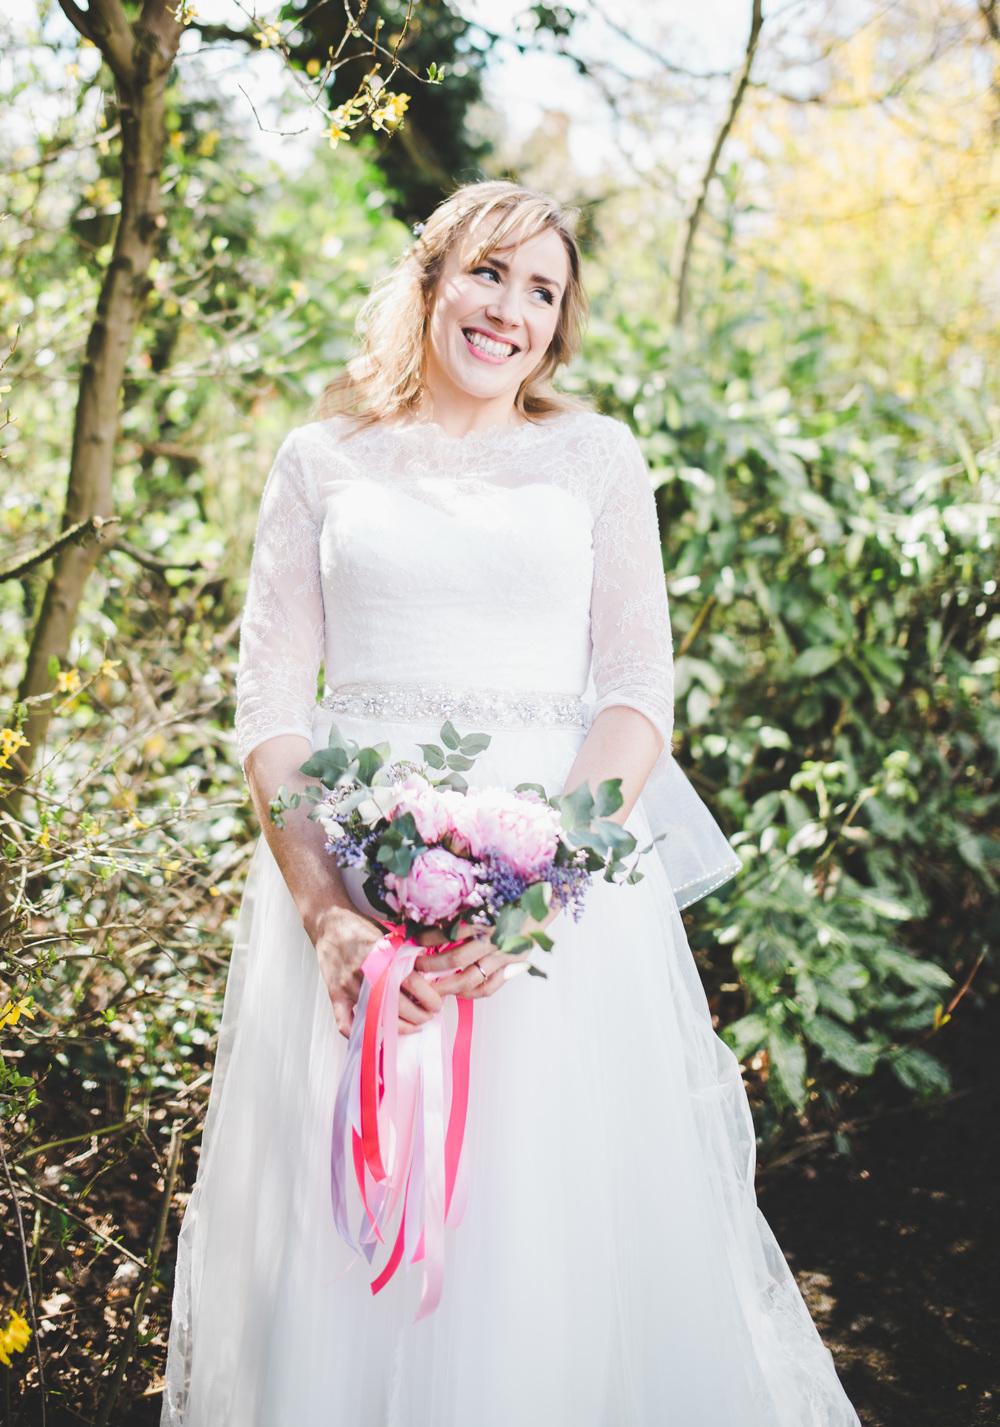 Cheshire wedding photographer - Marthall Hall Wedding (41).jpg